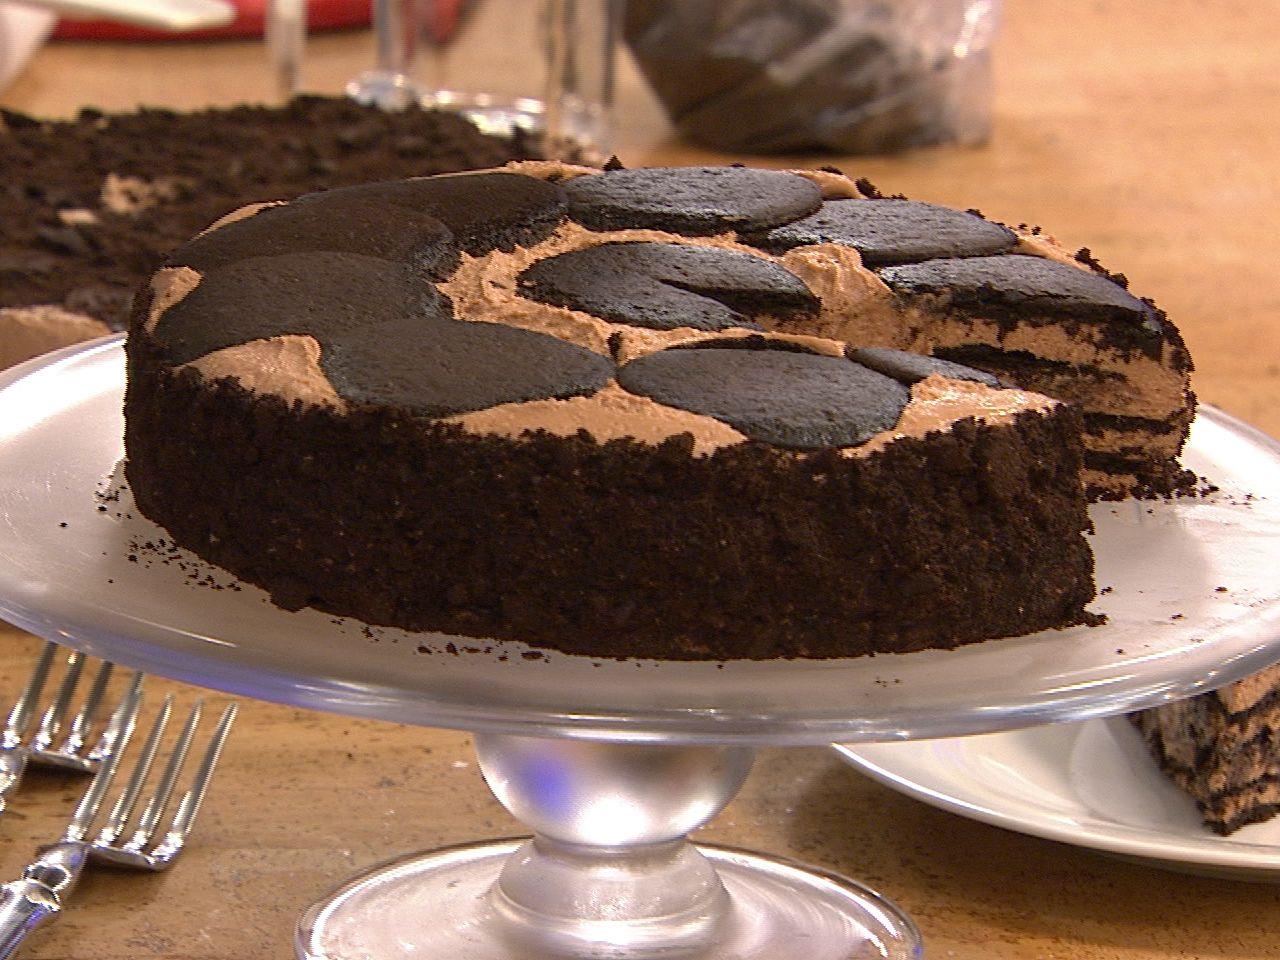 Want. This. Now. Gail Simmons' icebox chocolate cheesecake